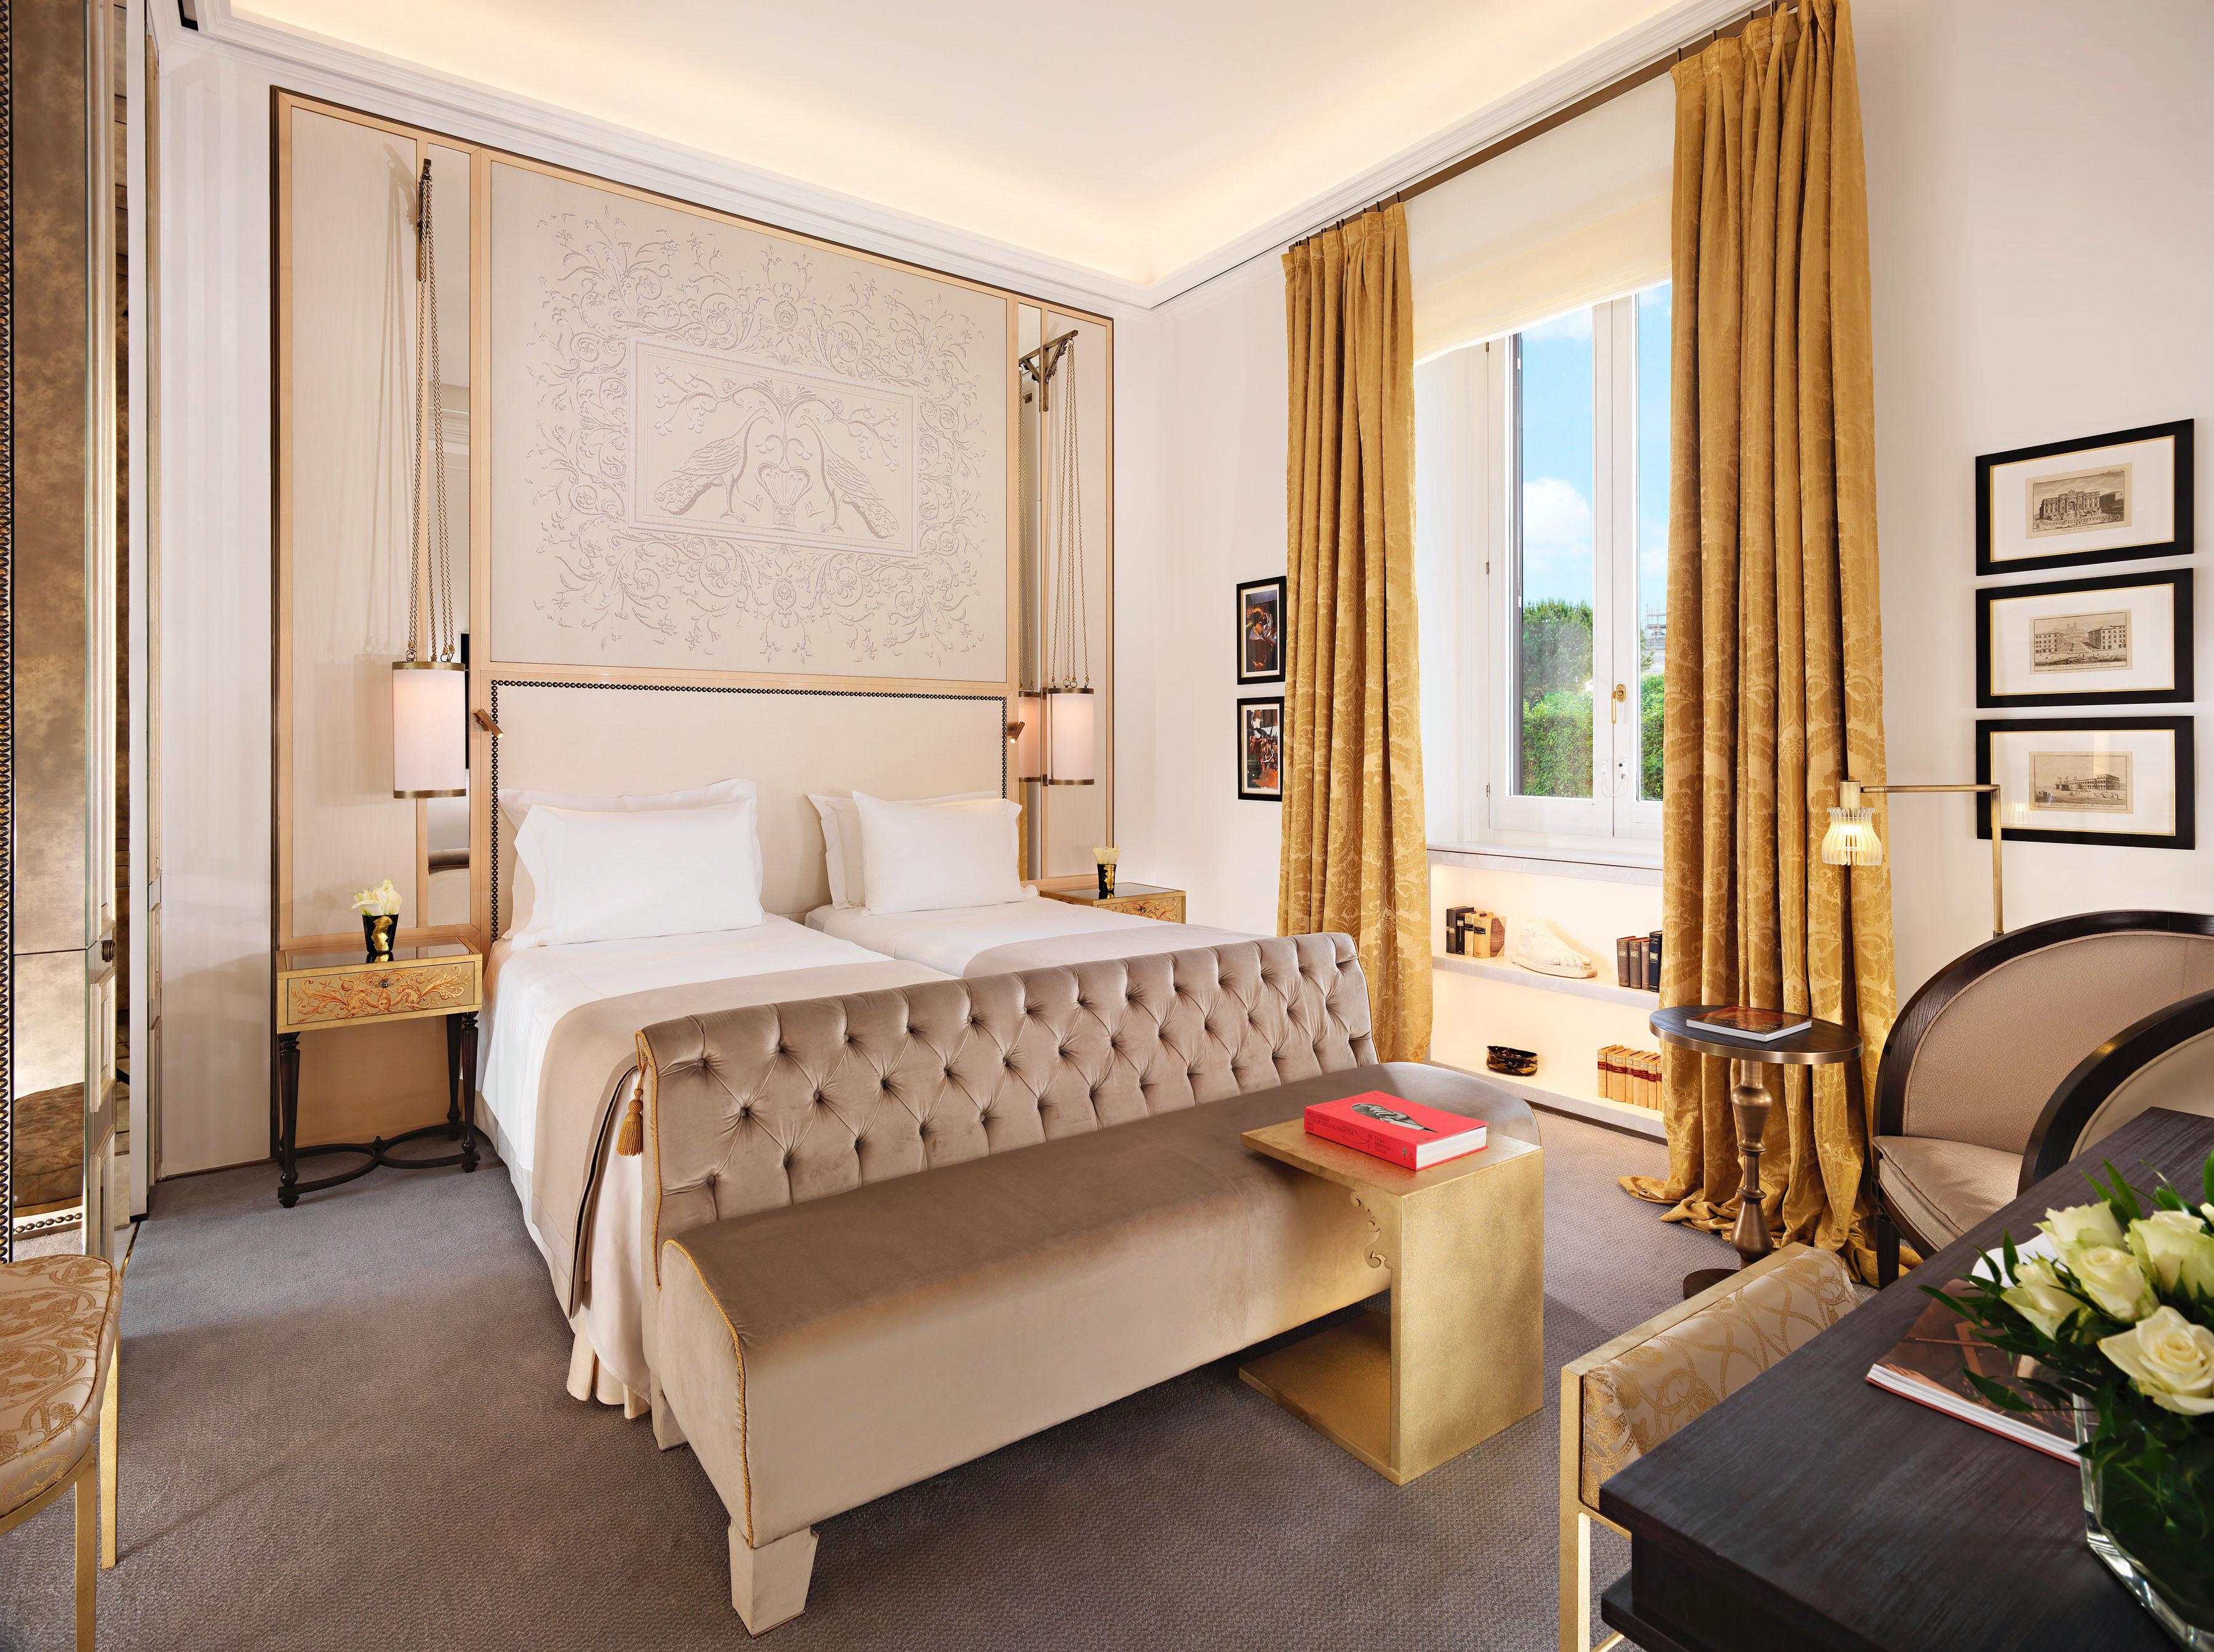 hotel eden hotel room rome